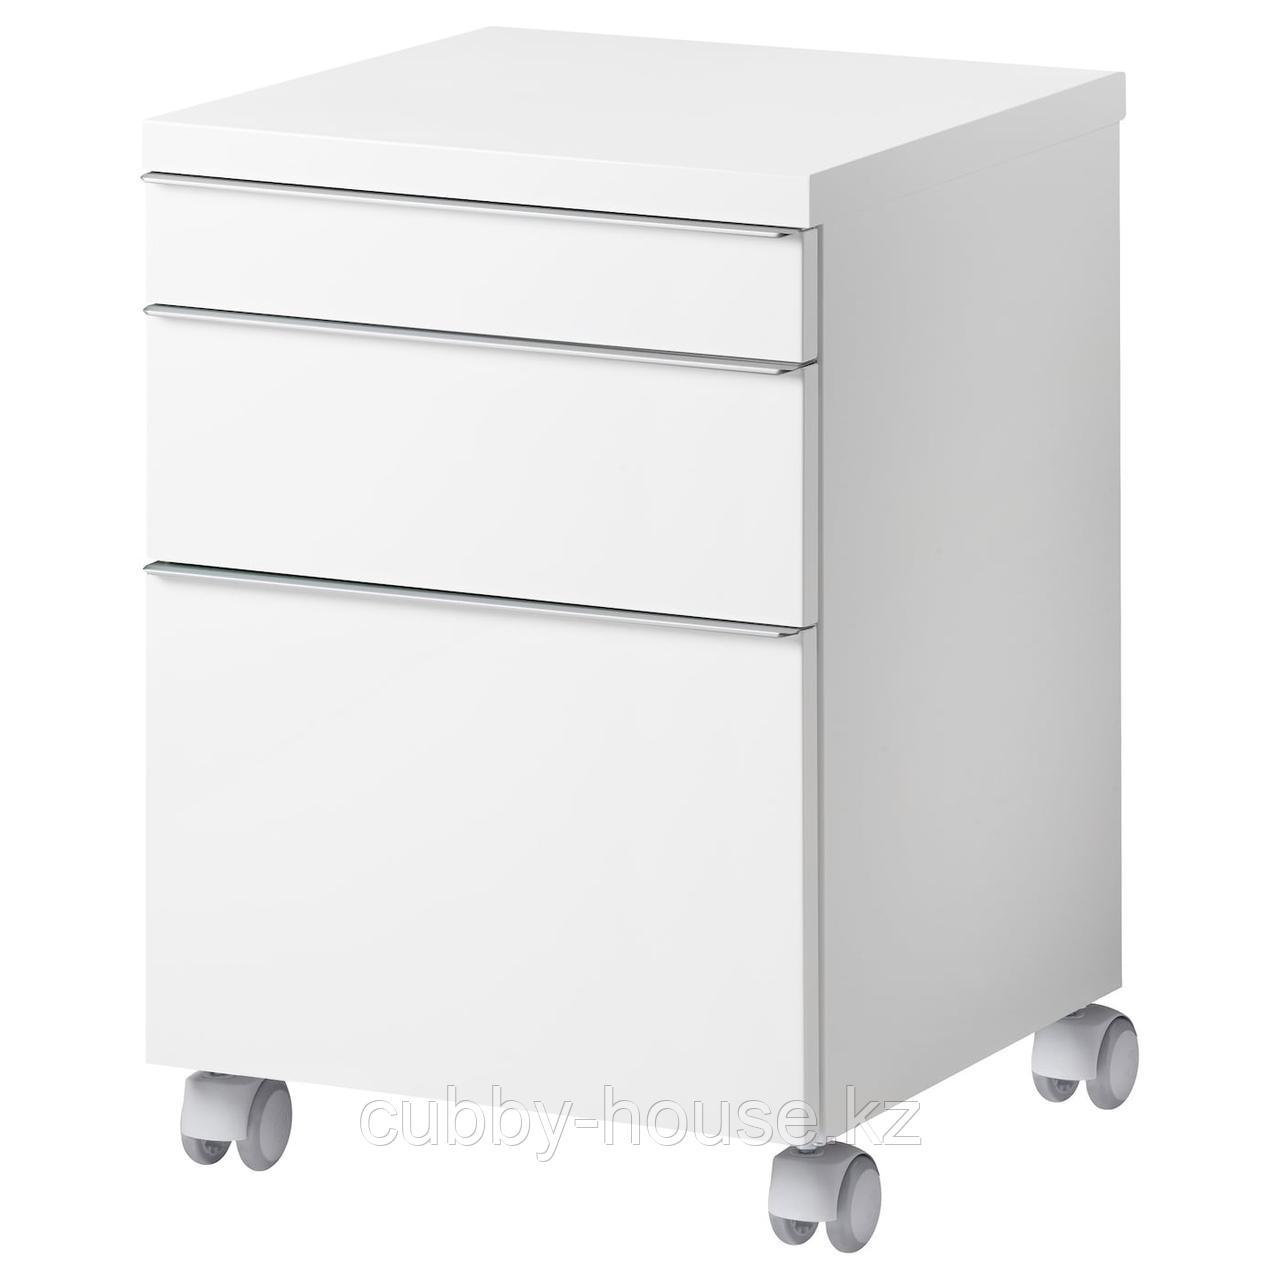 БЕСТО БУРС Тумба с ящиками на колесах, глянцевый белый, 40x40 см